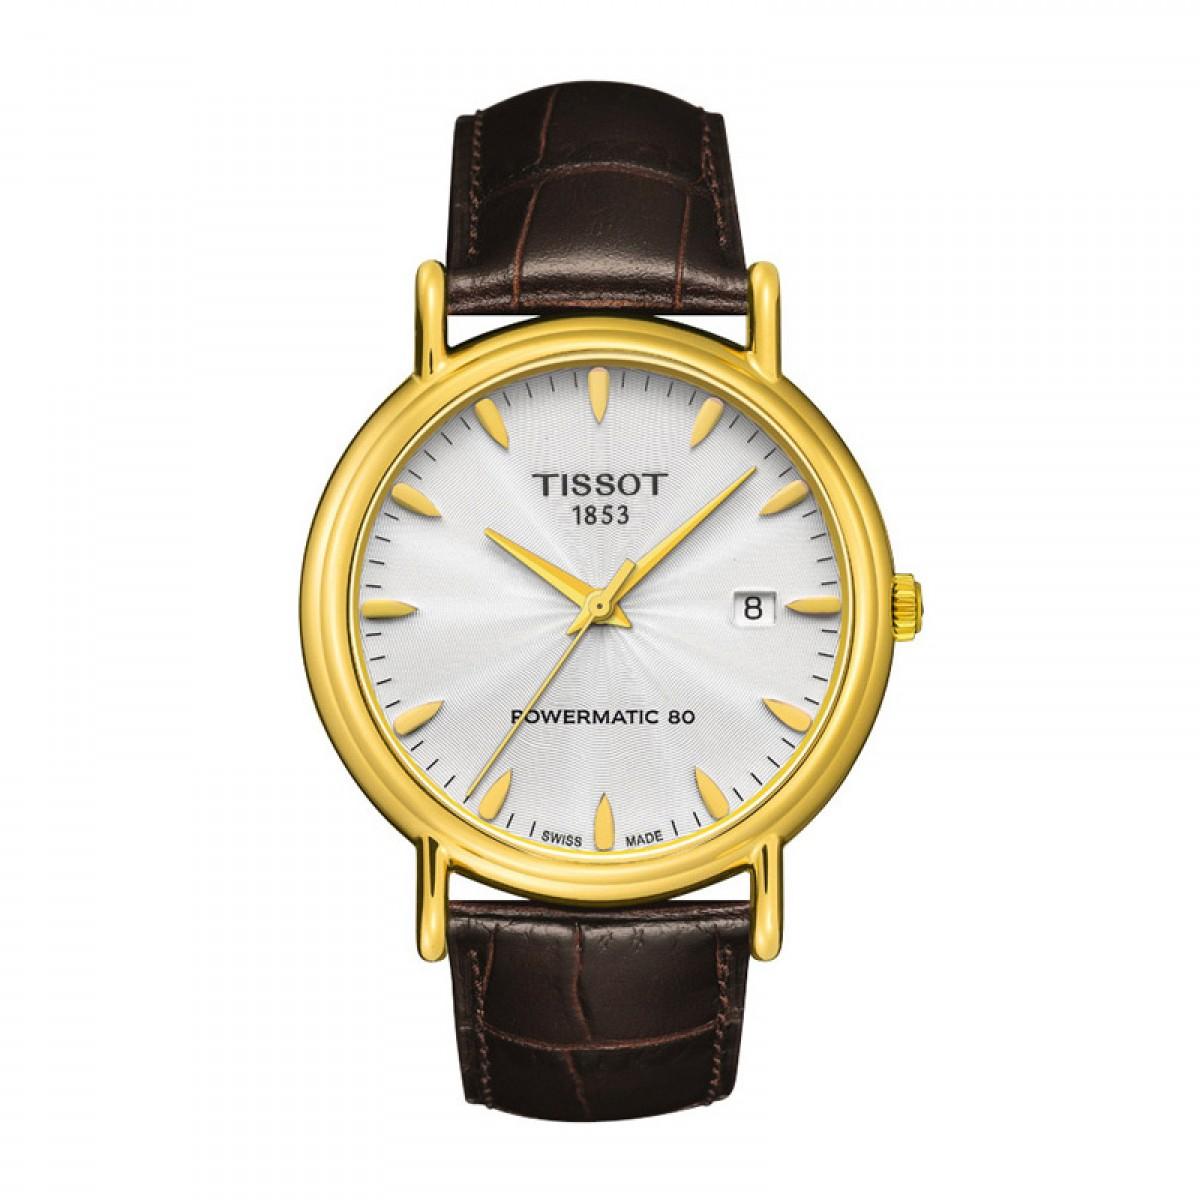 Часовник Tissot T907.407.16.031.00